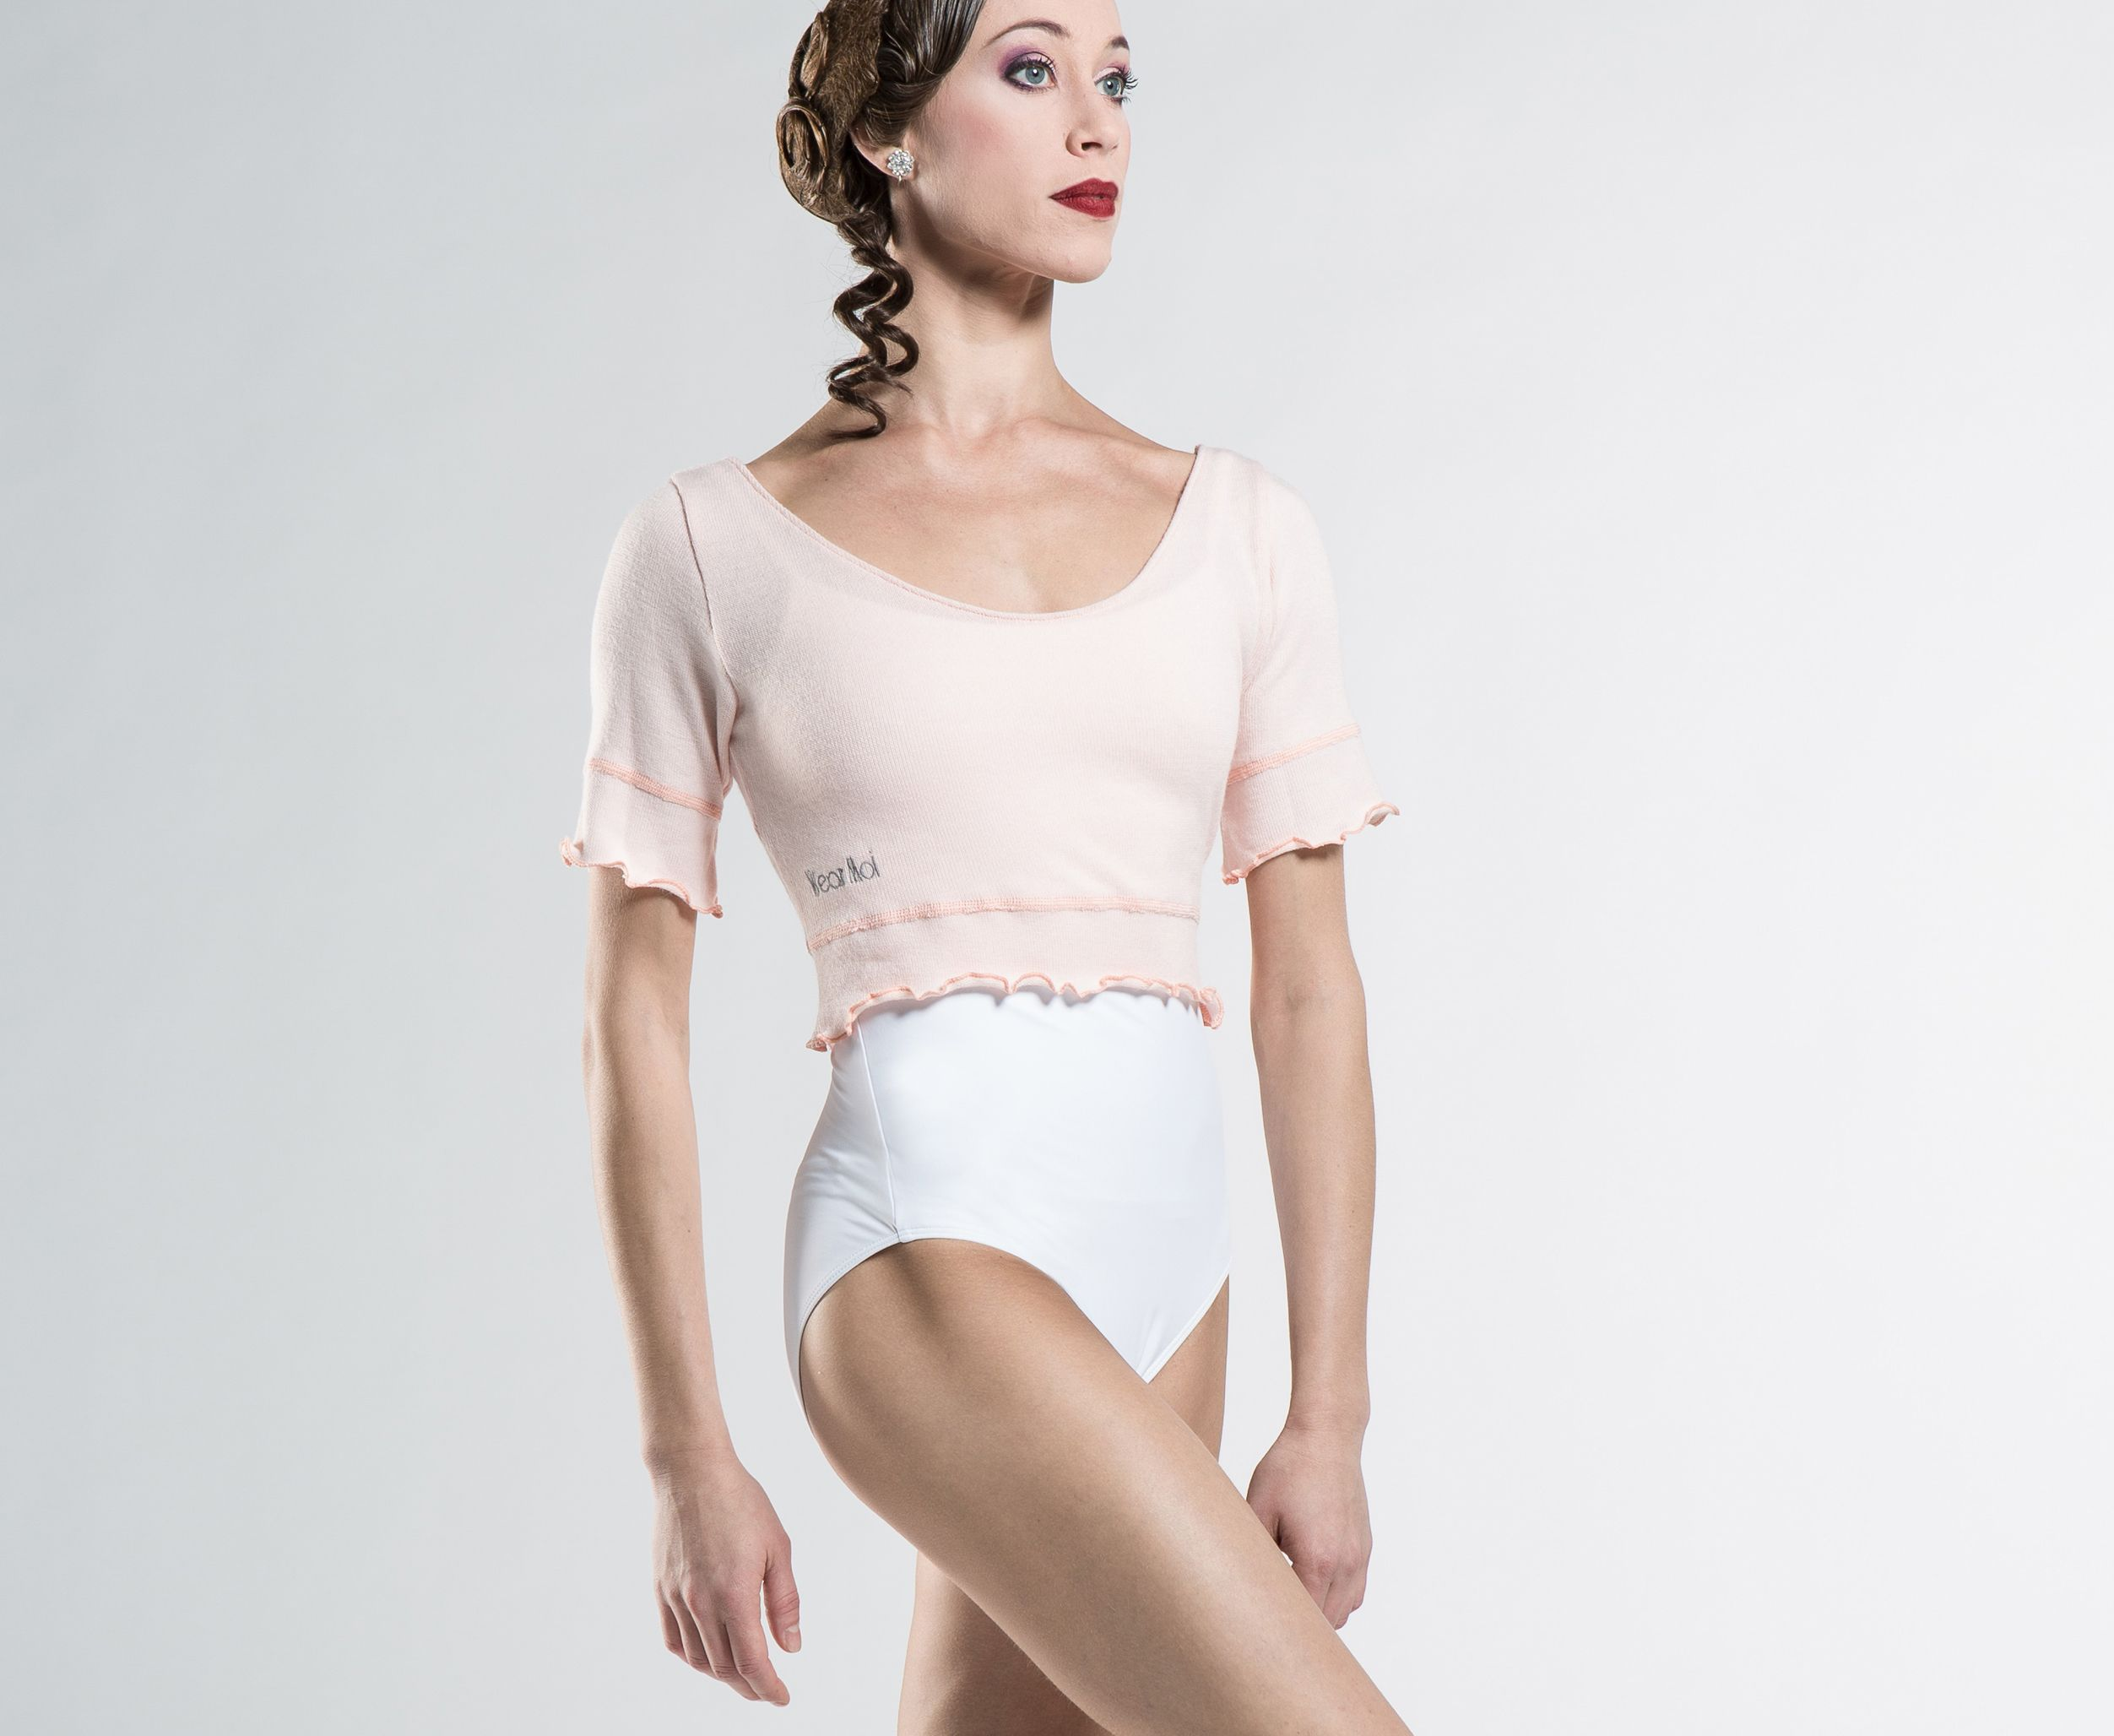 NAYA - Short sleeve crop top sweater. http://www.wearmoi.com/store/item/278-naya